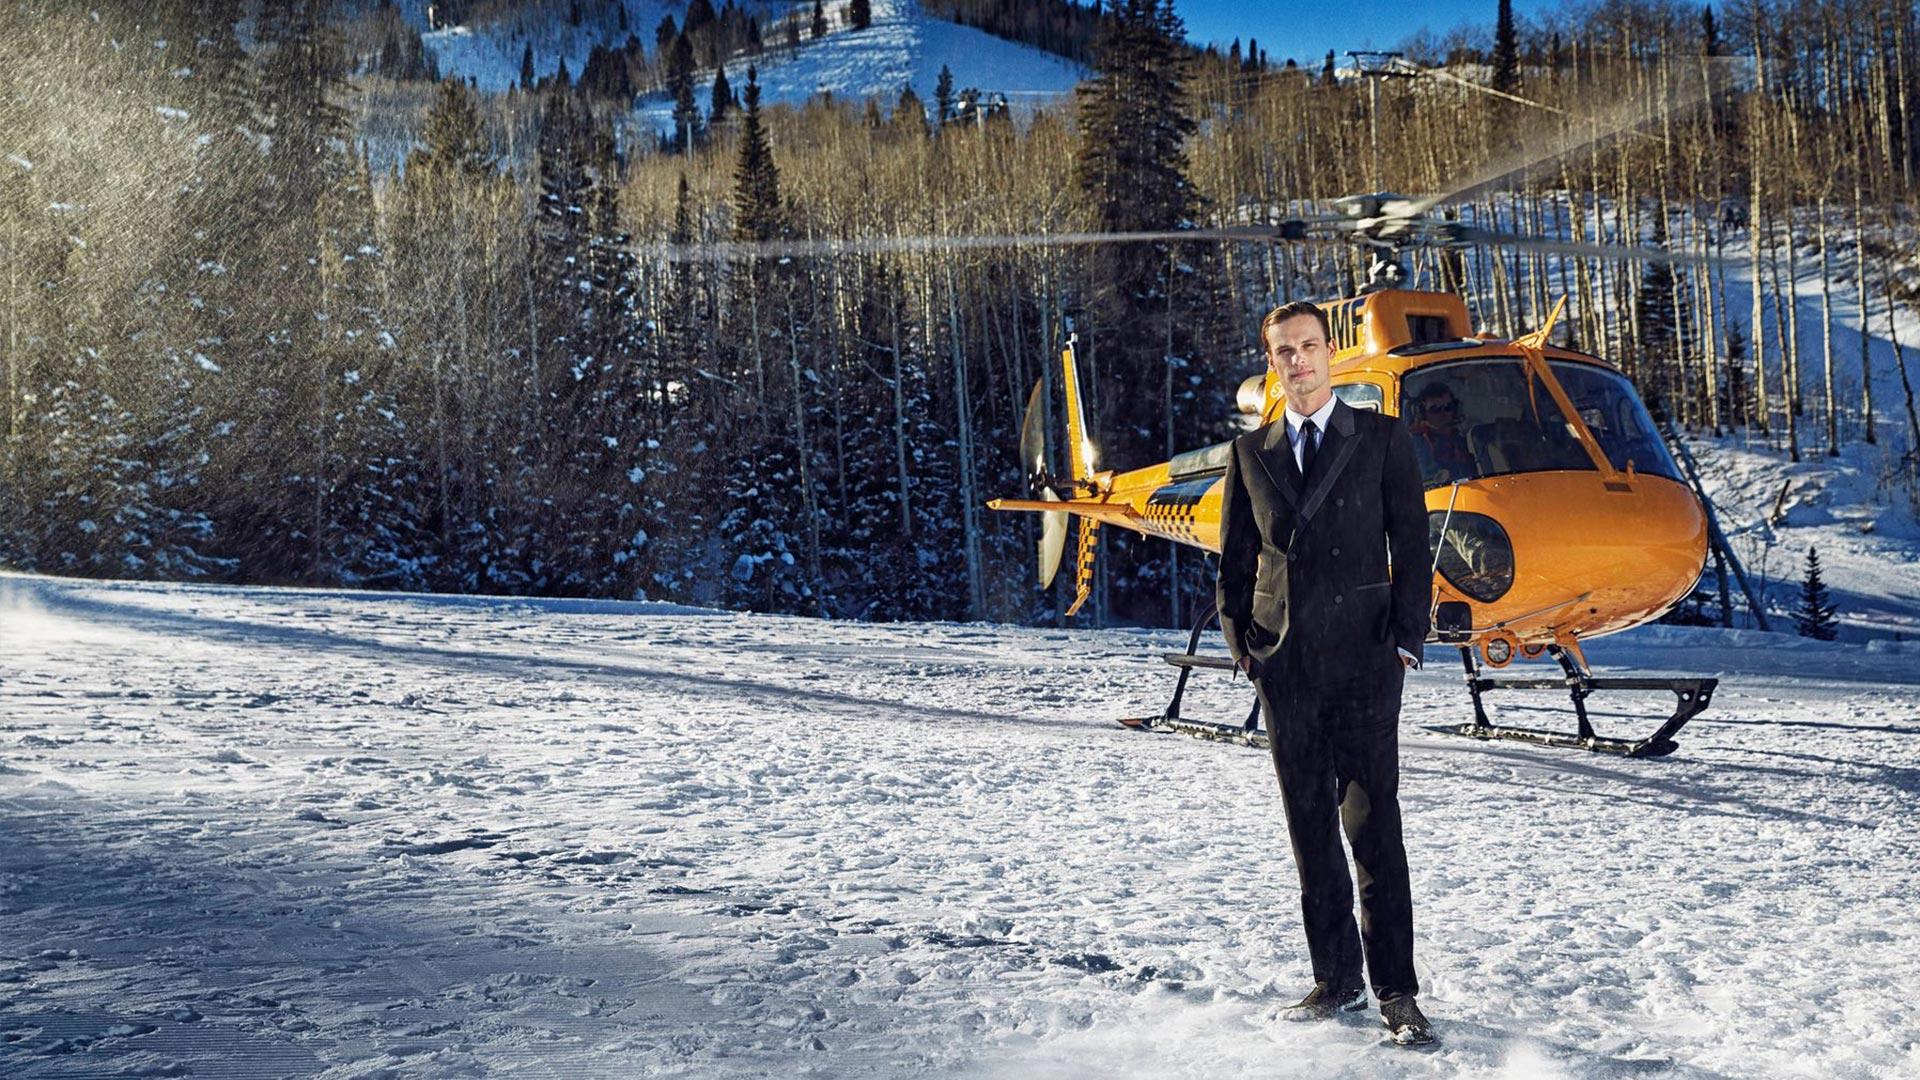 Dr. Spencer Reid, aka James Bond, is a smooth criminal